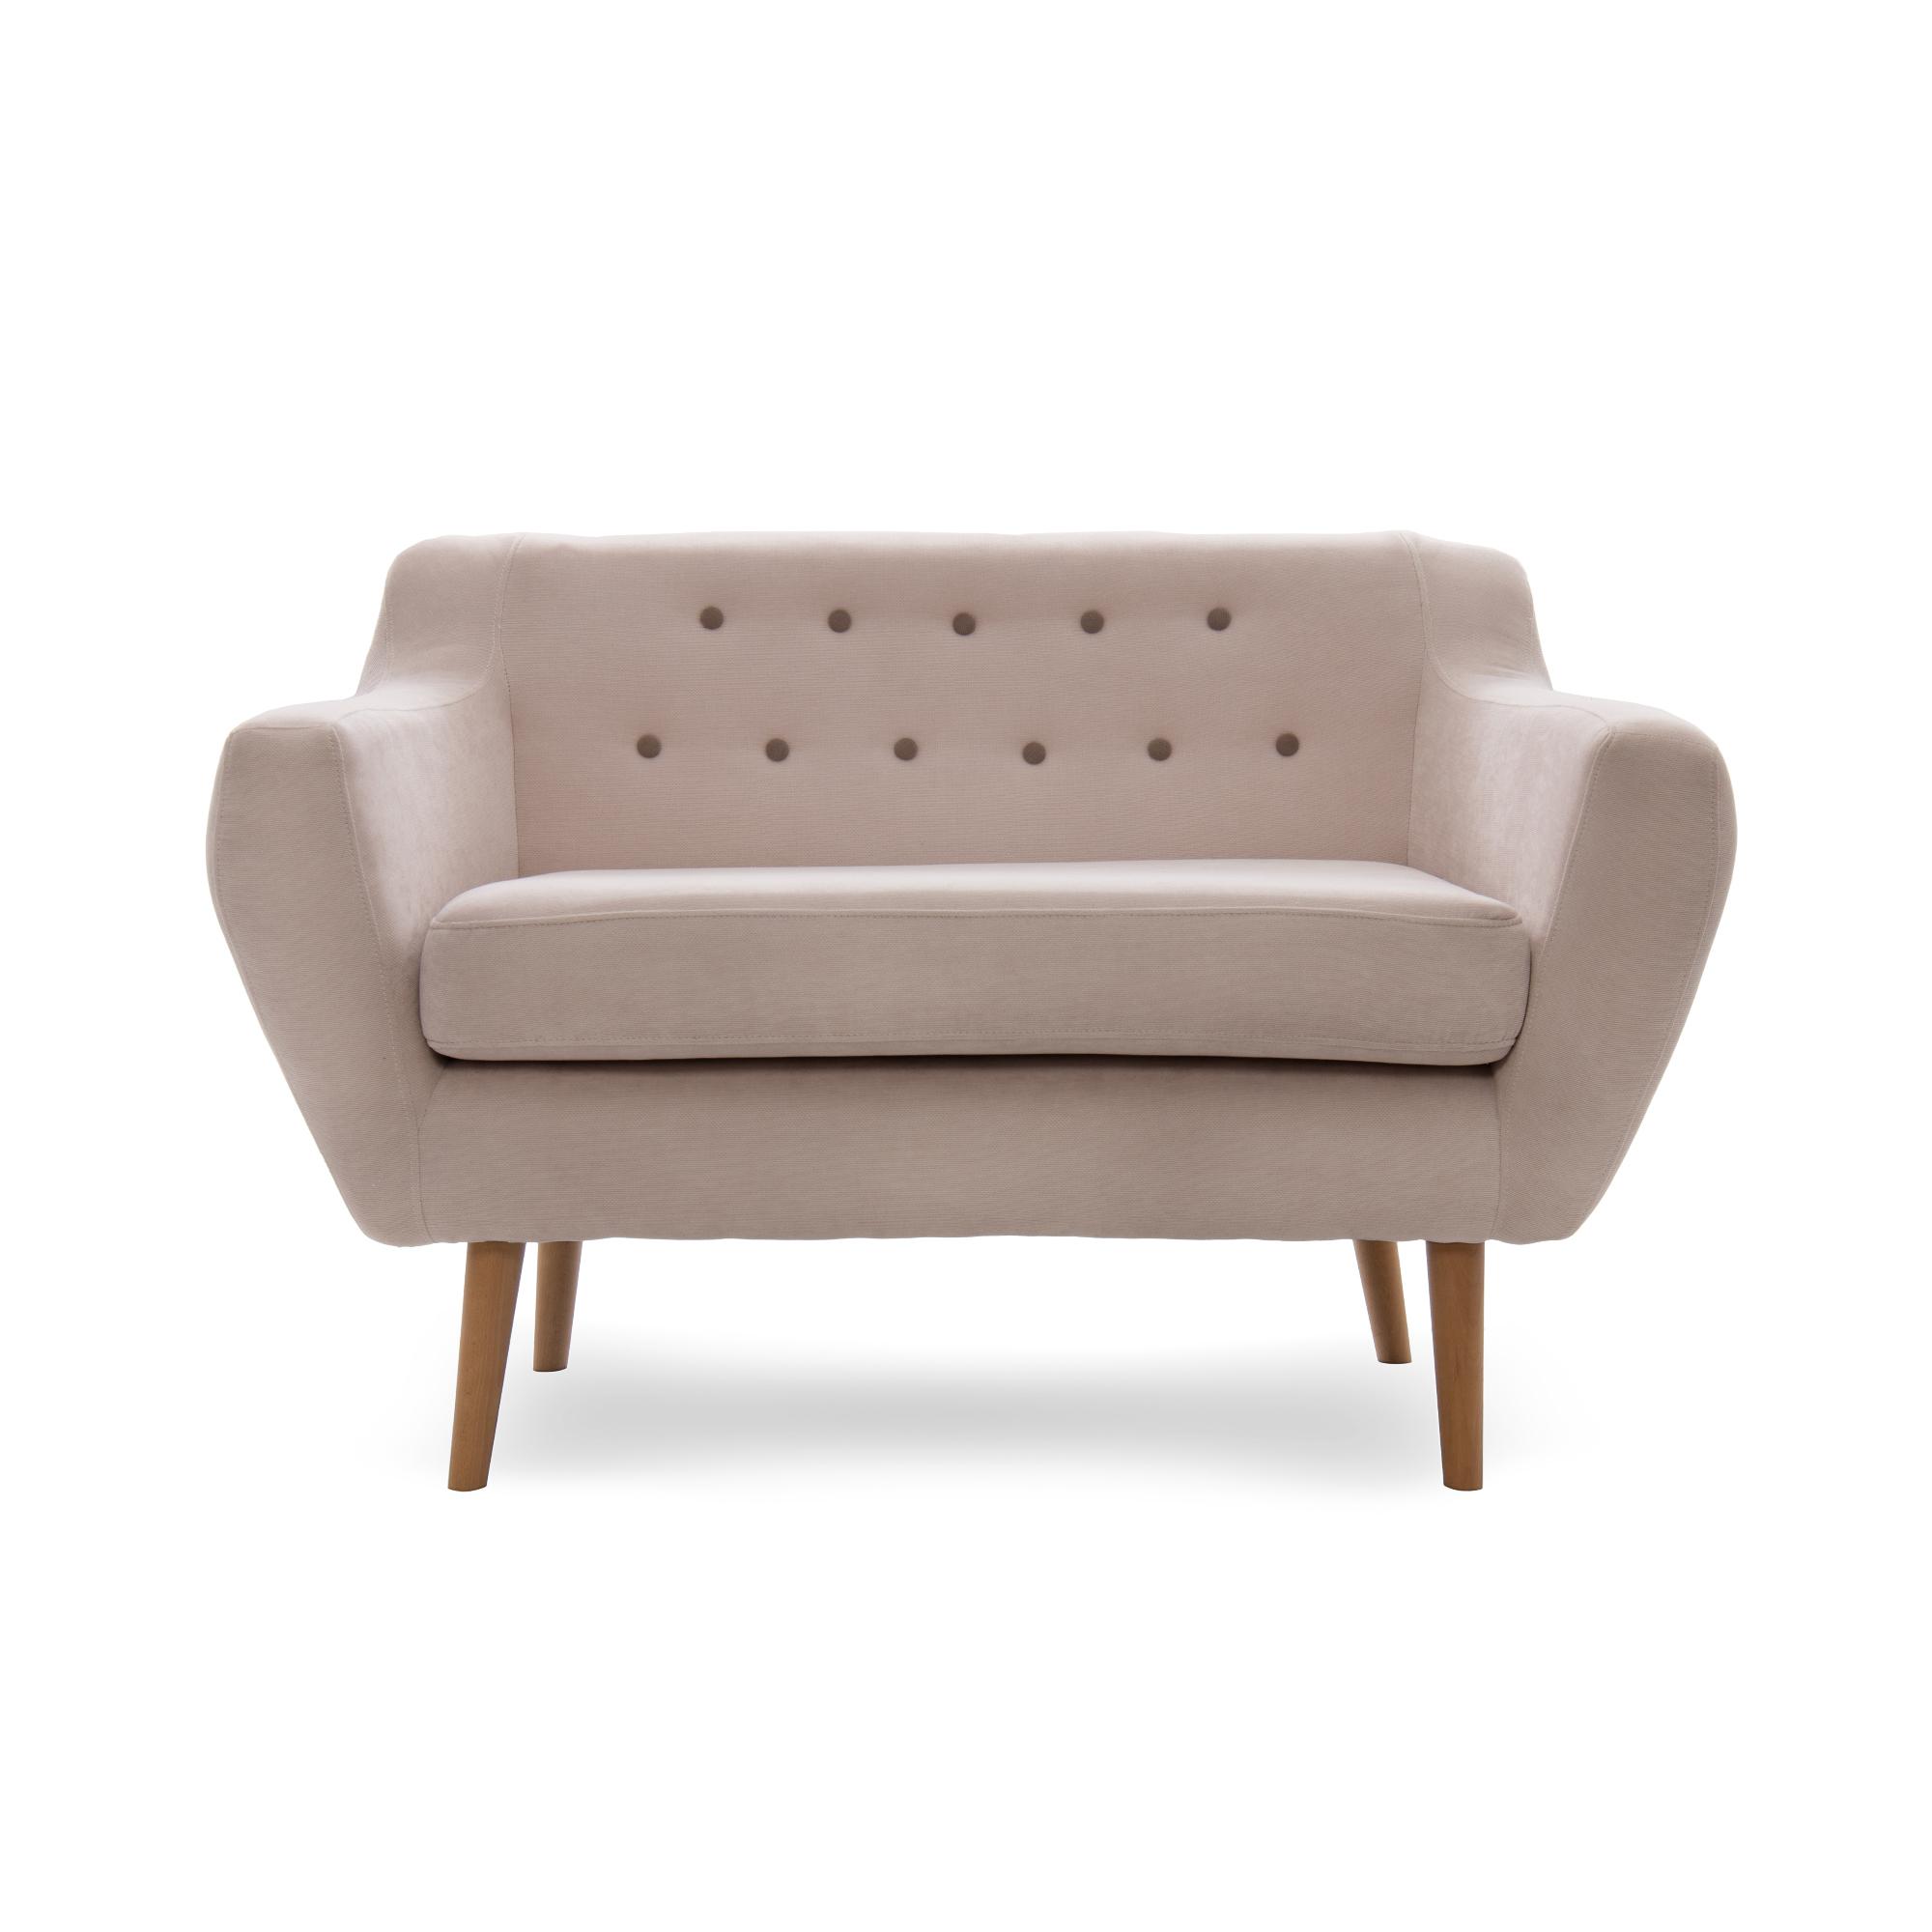 Canapea Fixa 2 locuri Kelly Beige/Natural